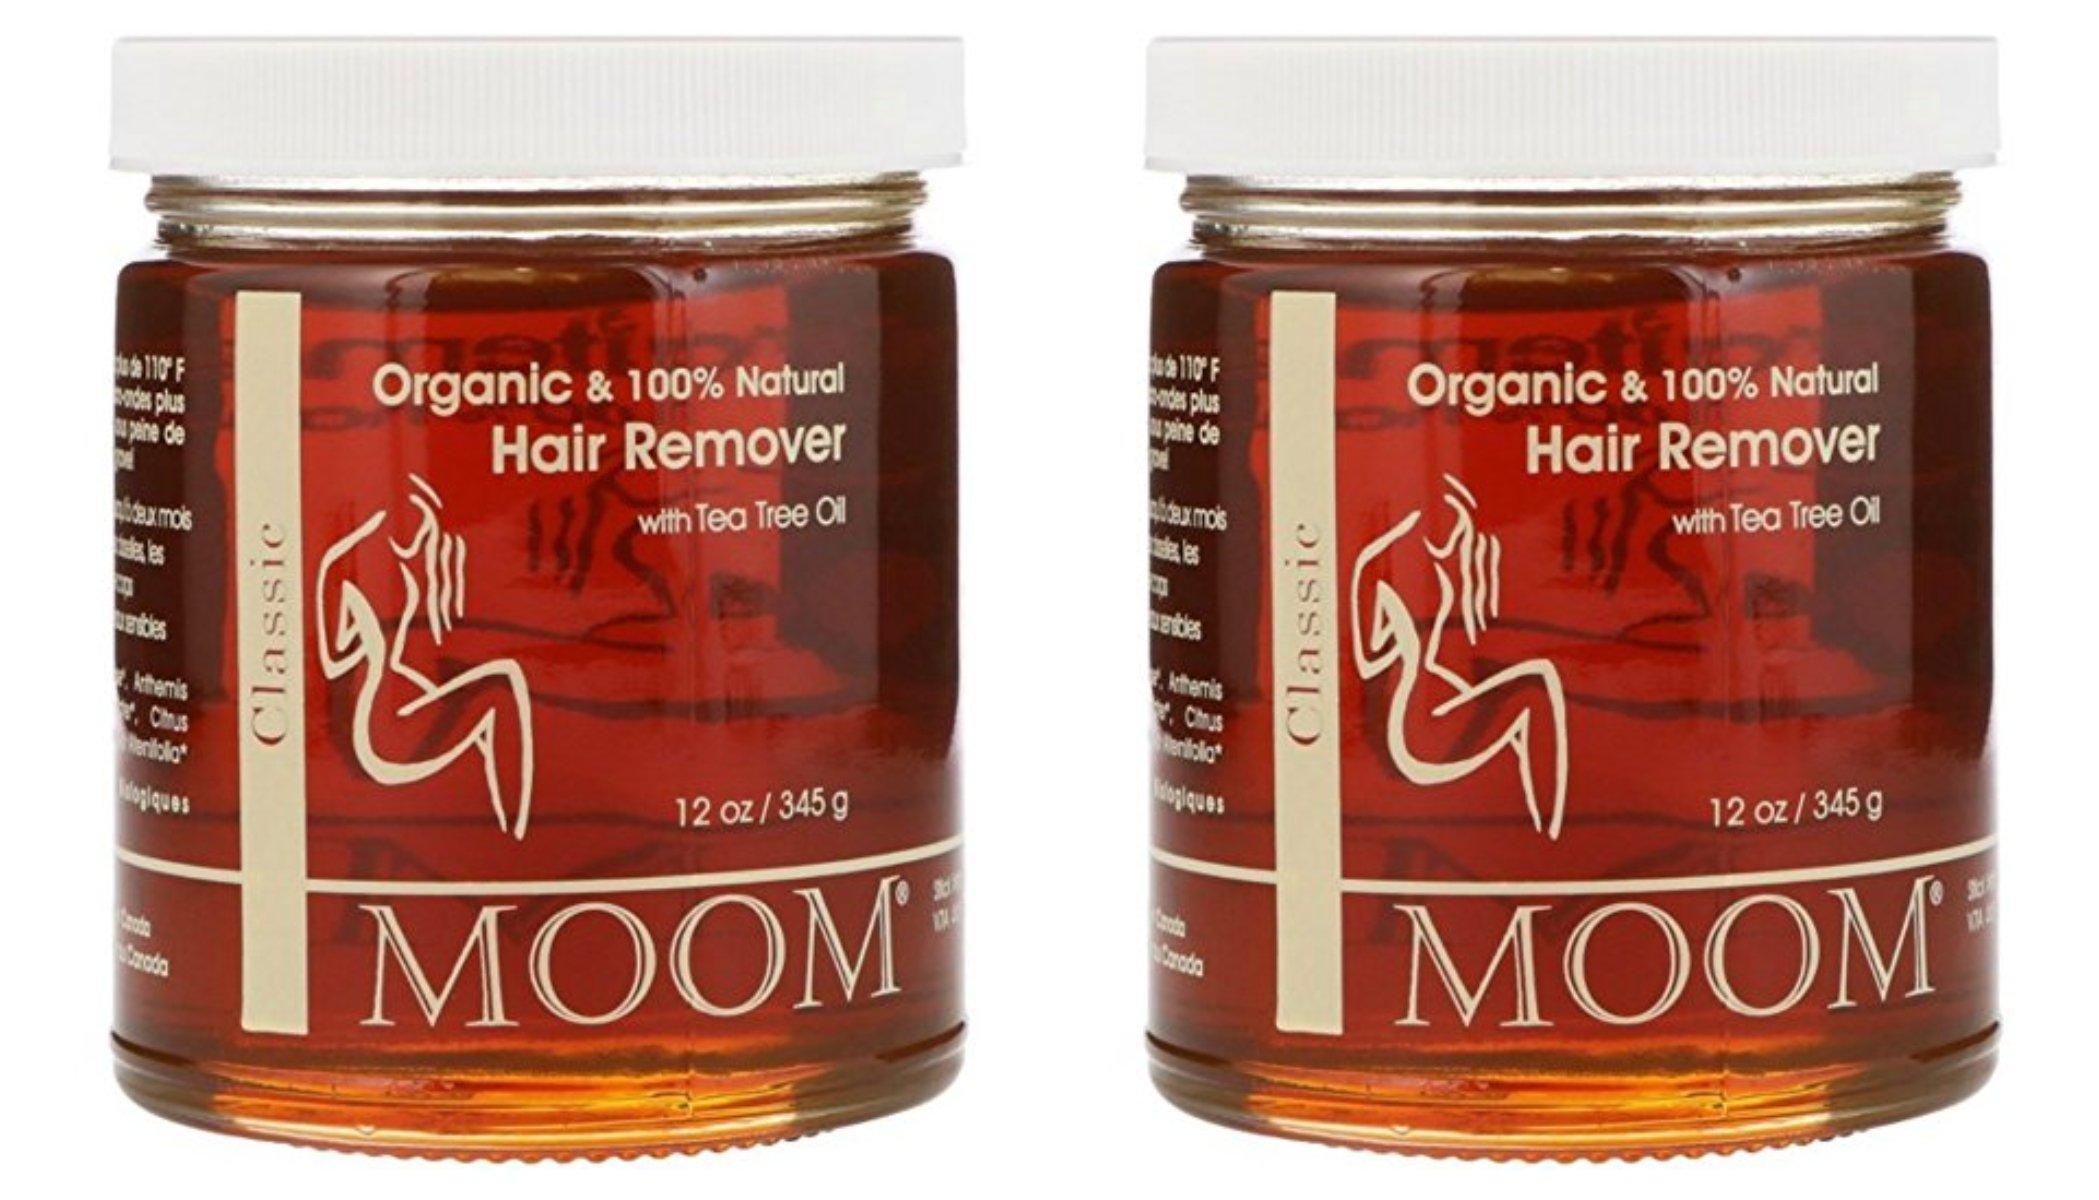 Moom Organic Hair Removal With Tea Tree Refill Jar - 12 oz (Pack of 2)